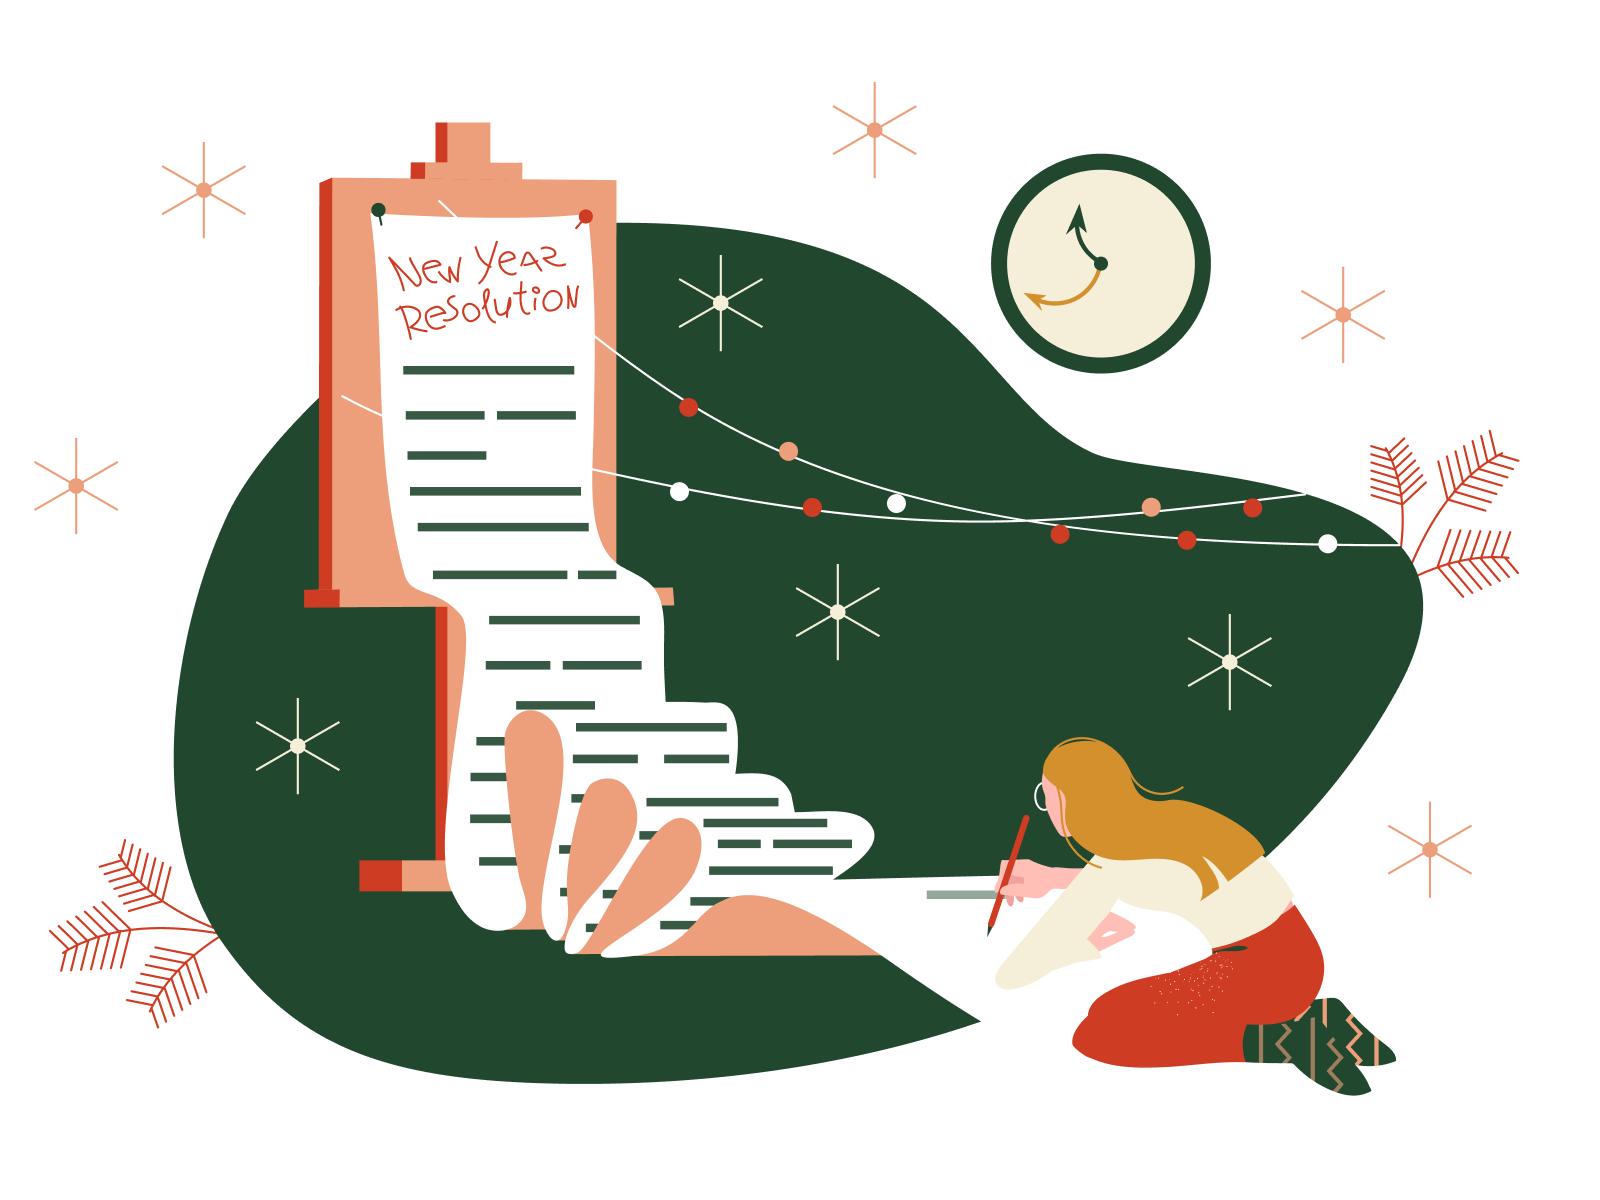 icons8 christmas illustration new year